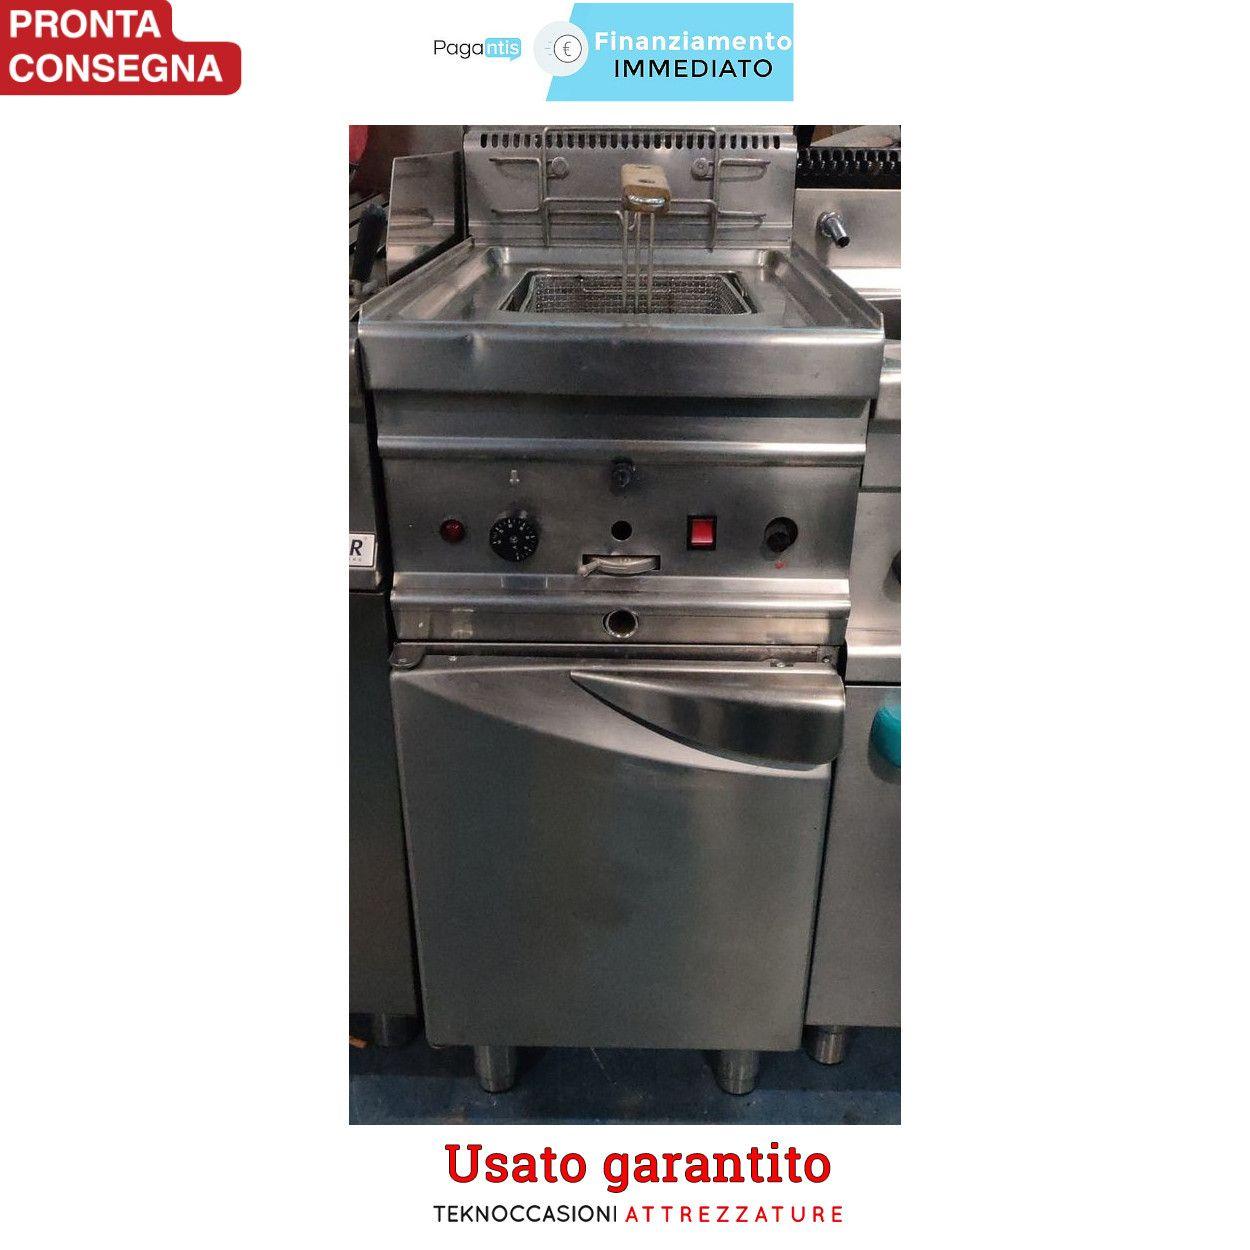 Friggitrice Bertos litri 13 usato garantito